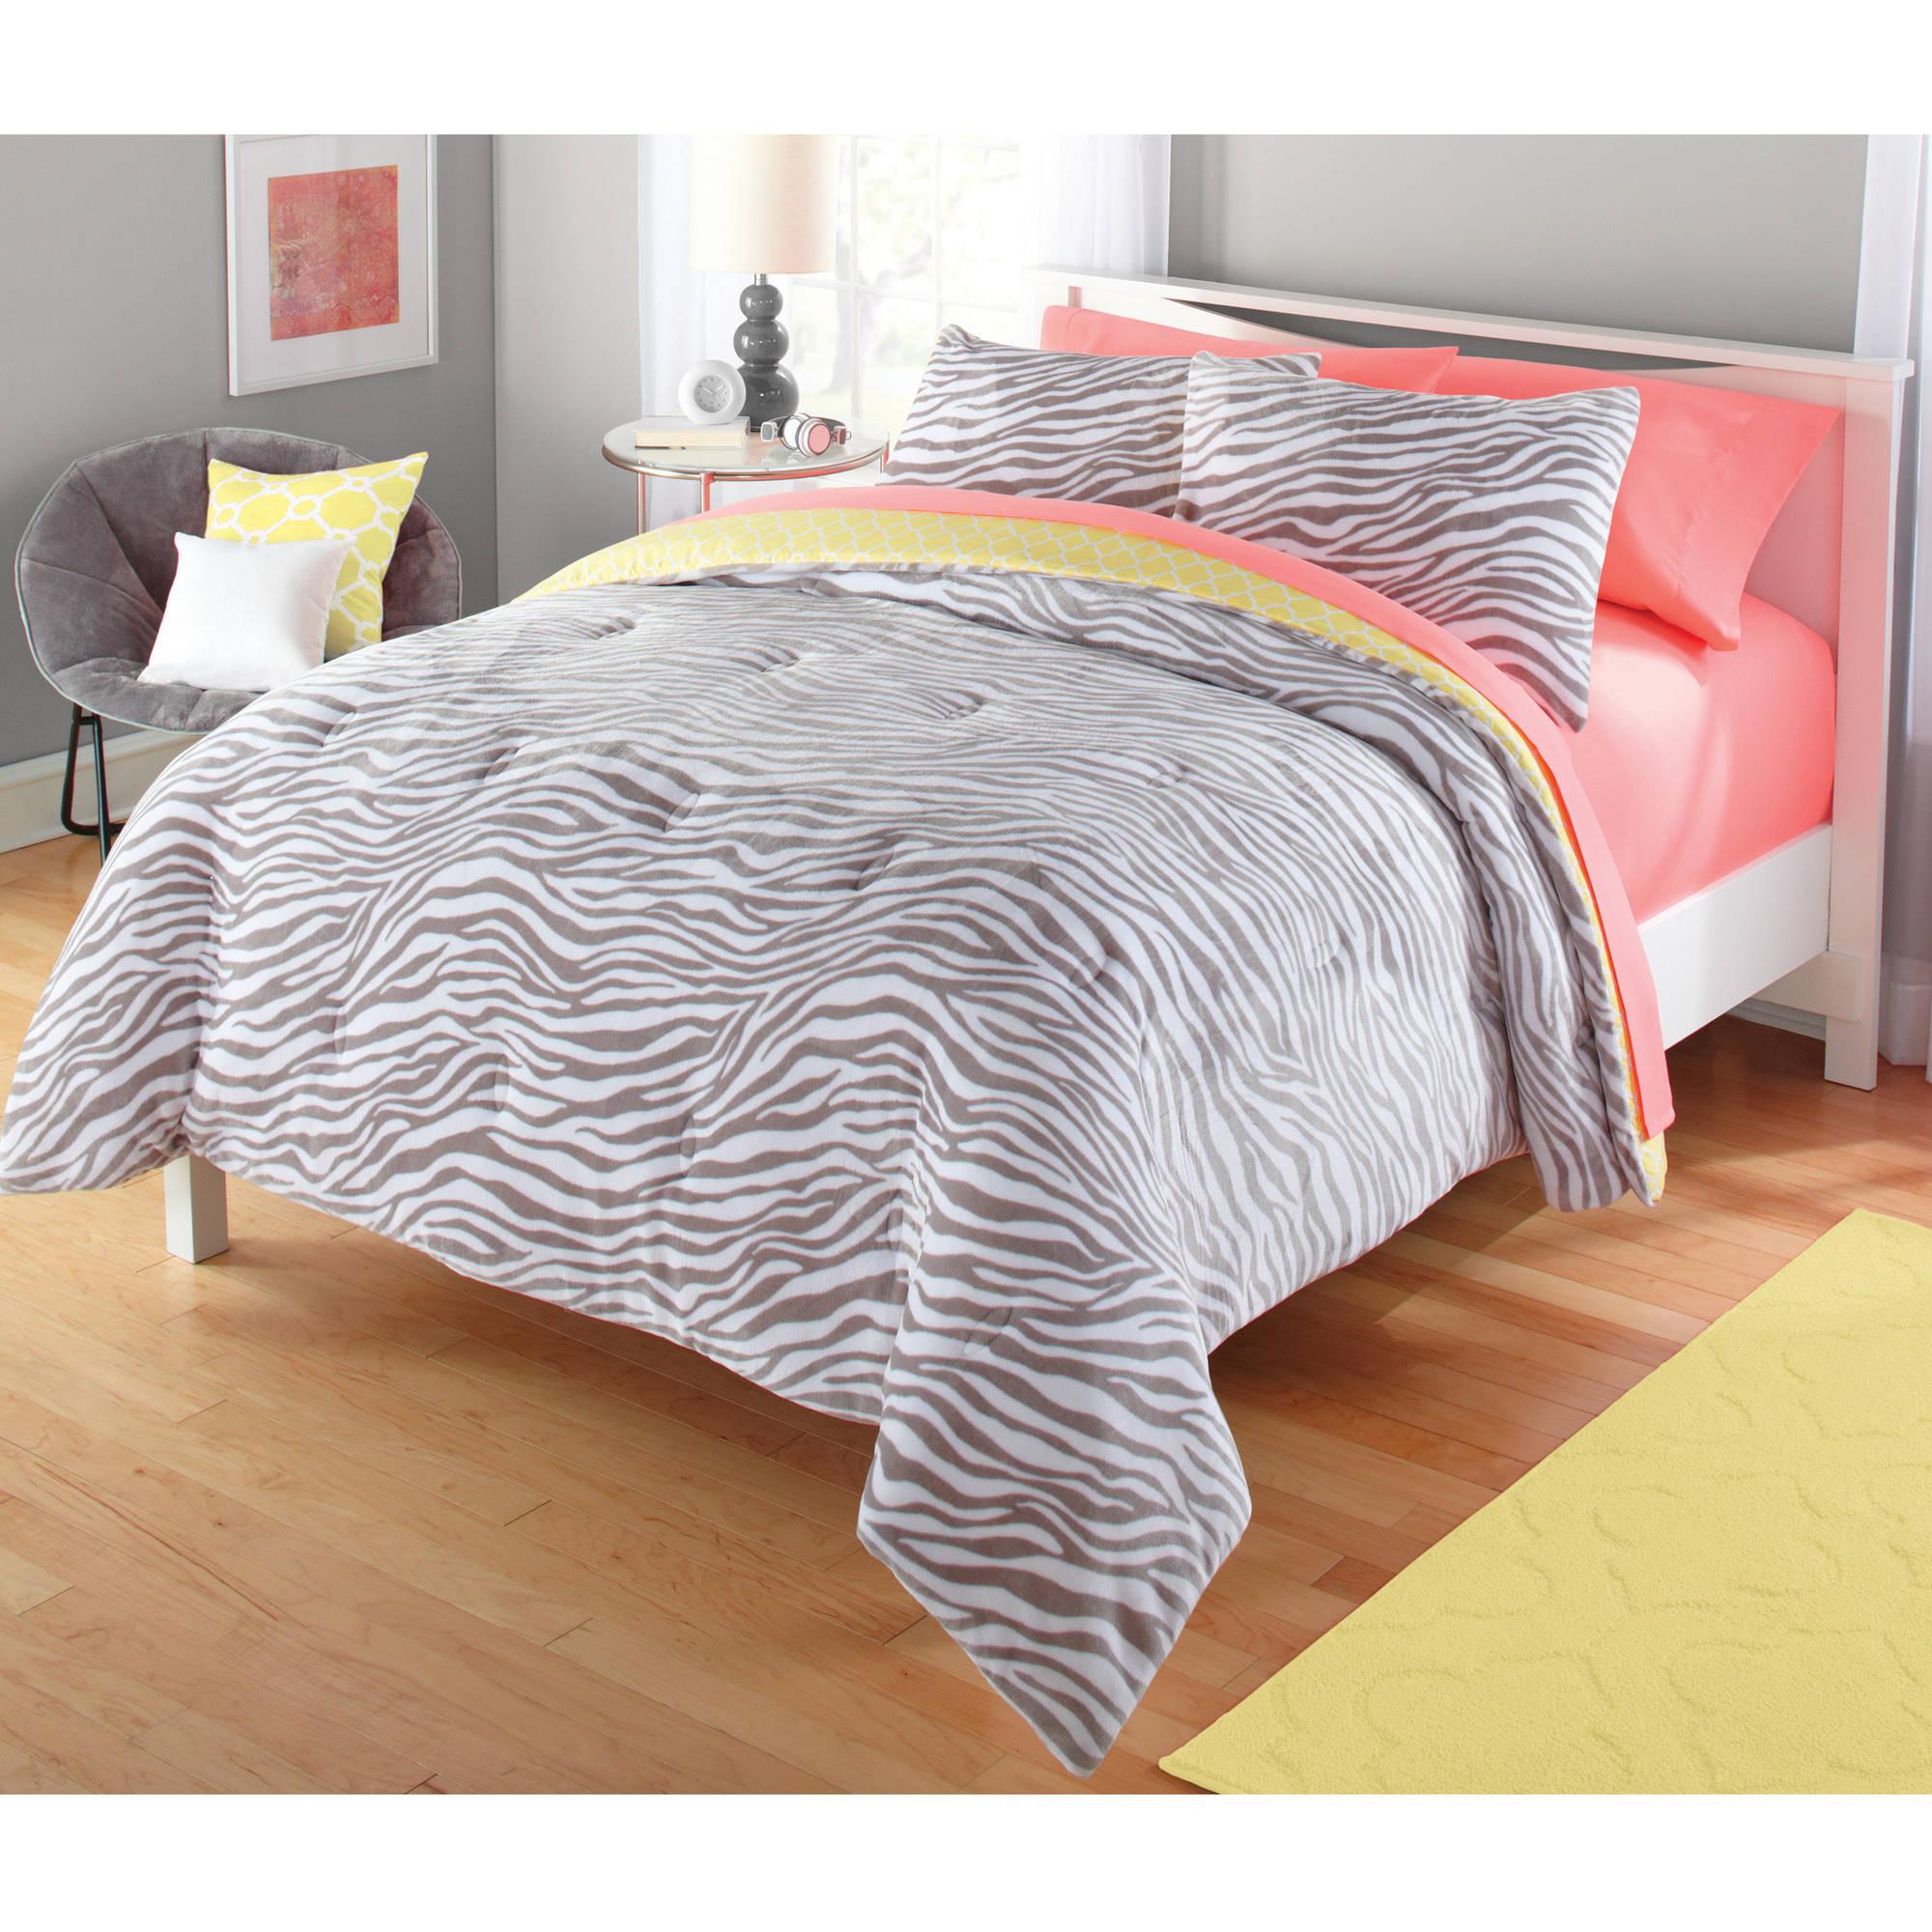 your zone gray and yellow zebra comforter set